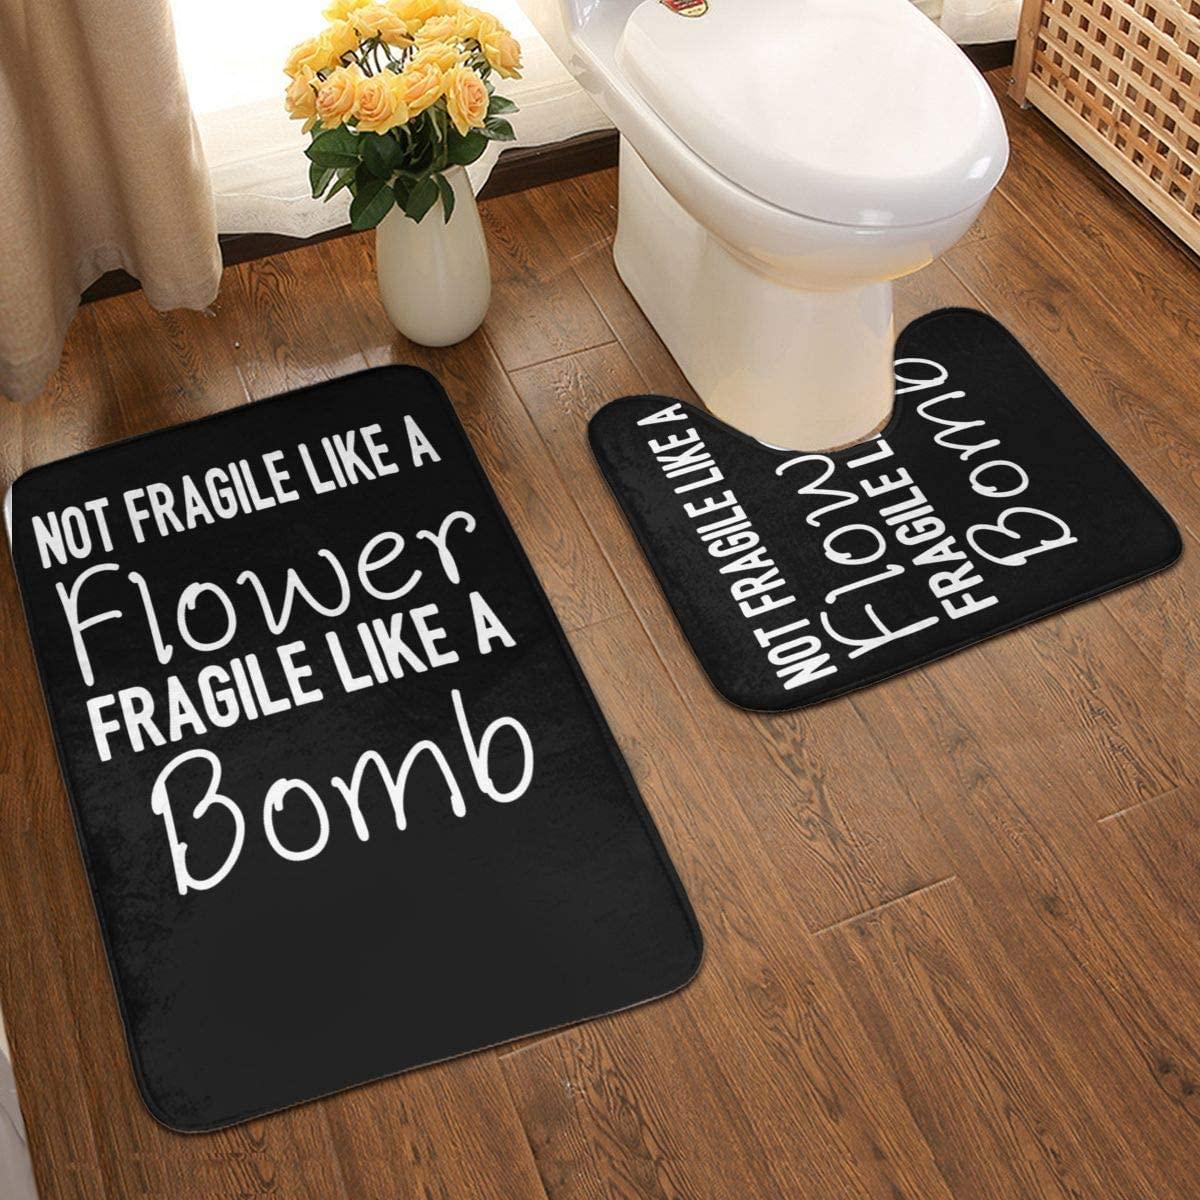 Not Fragile Like a Flower Bathroom Antiskid Pad Non-Slip Bath Carpet Floor Mat Rug 2 Sets -Floor Mat+U-Shaped Pad, Toilet Washable Blanket Mats for Bathroom Home Shower